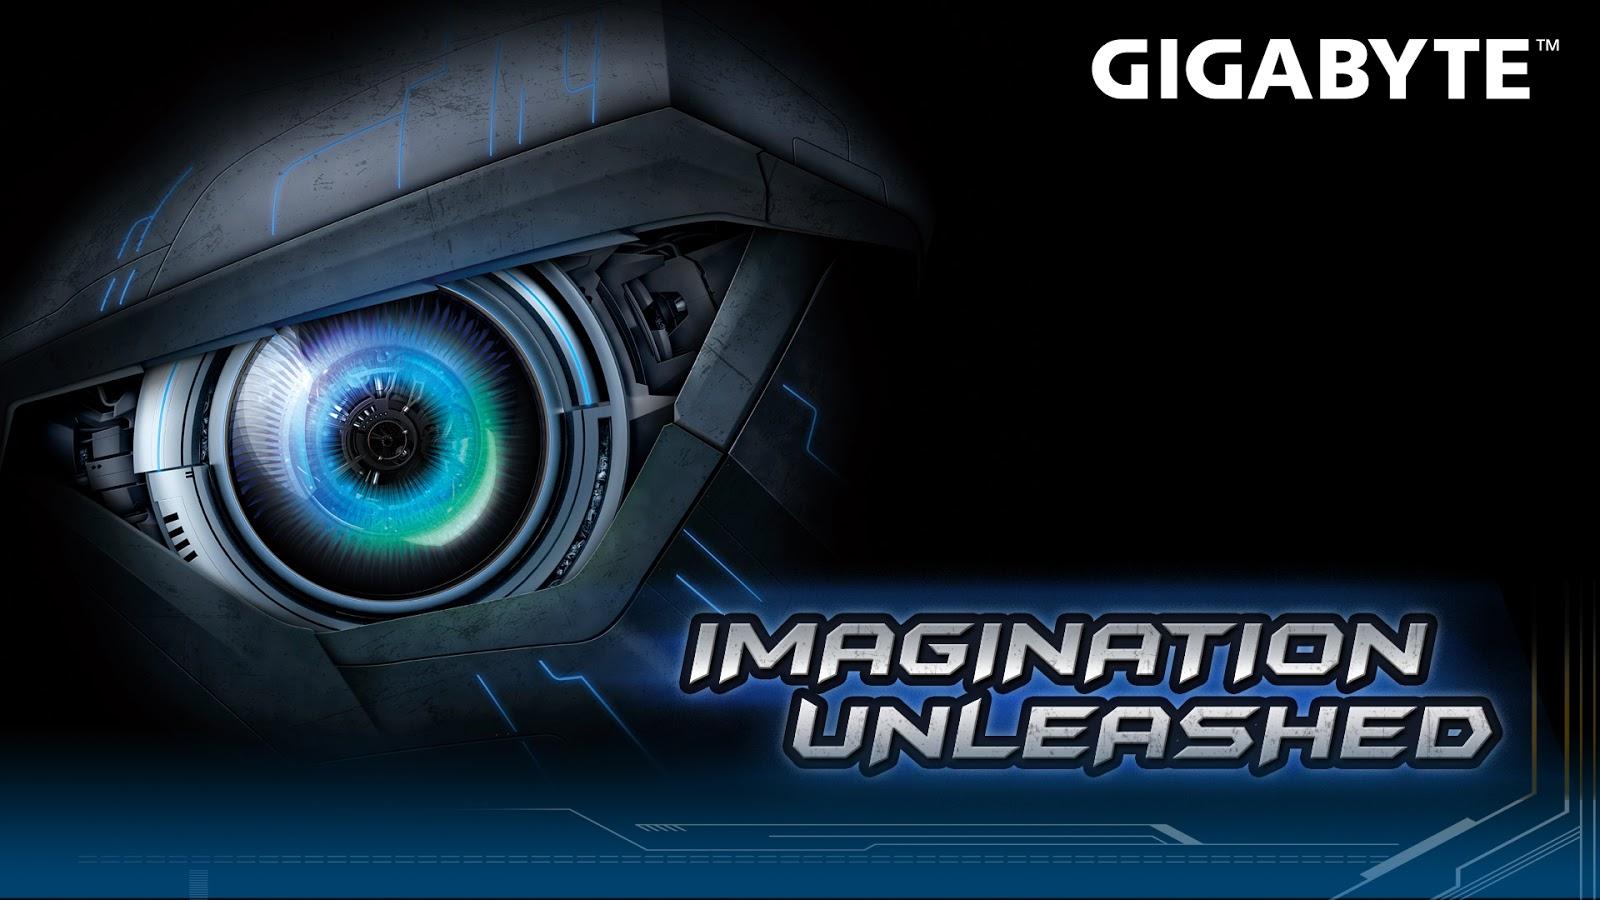 nvidia intel gigabyte wallpaper - photo #22